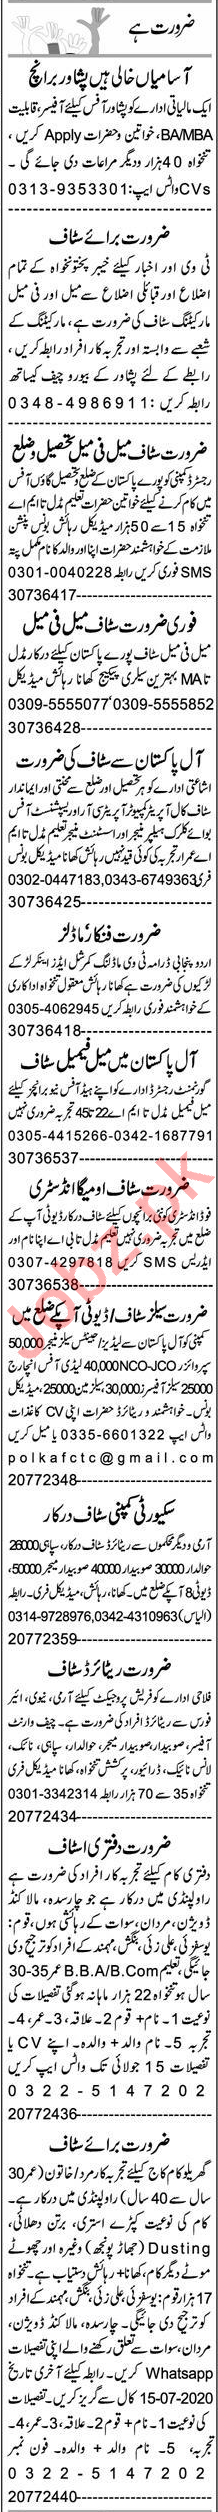 Branch Manager & HR Officer Jobs 2020 in Peshawar